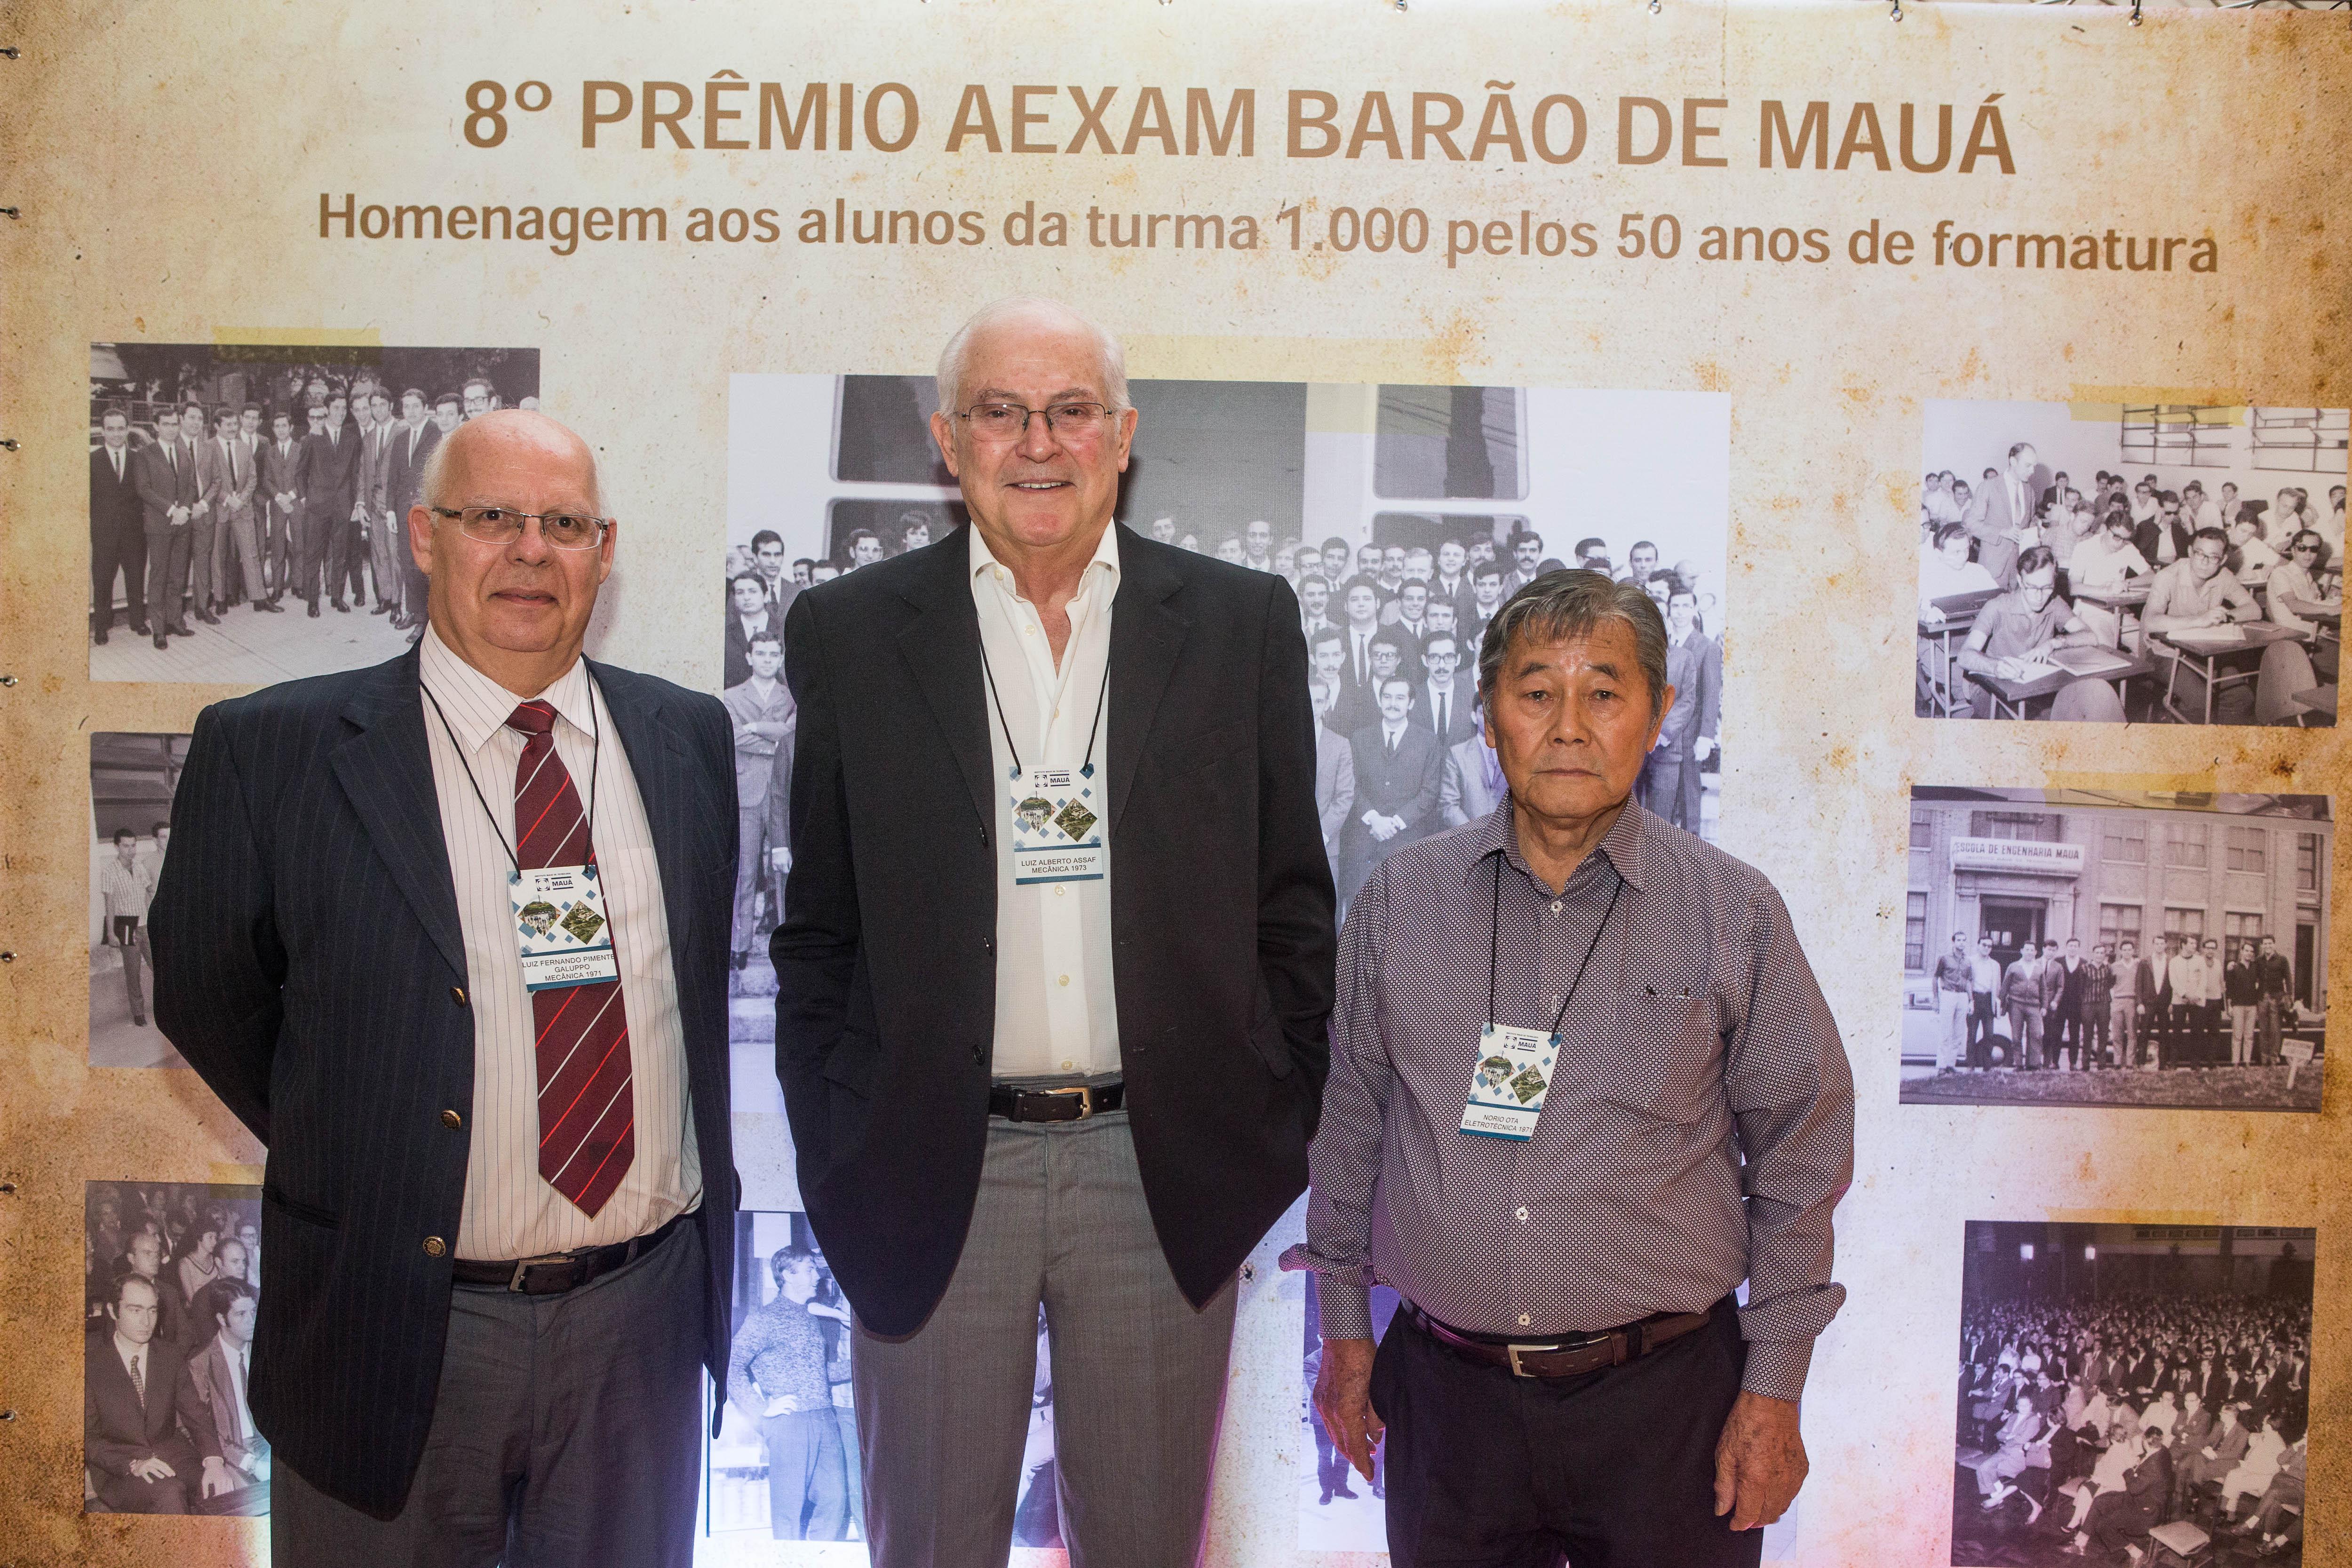 8_ Premio AEXAM417